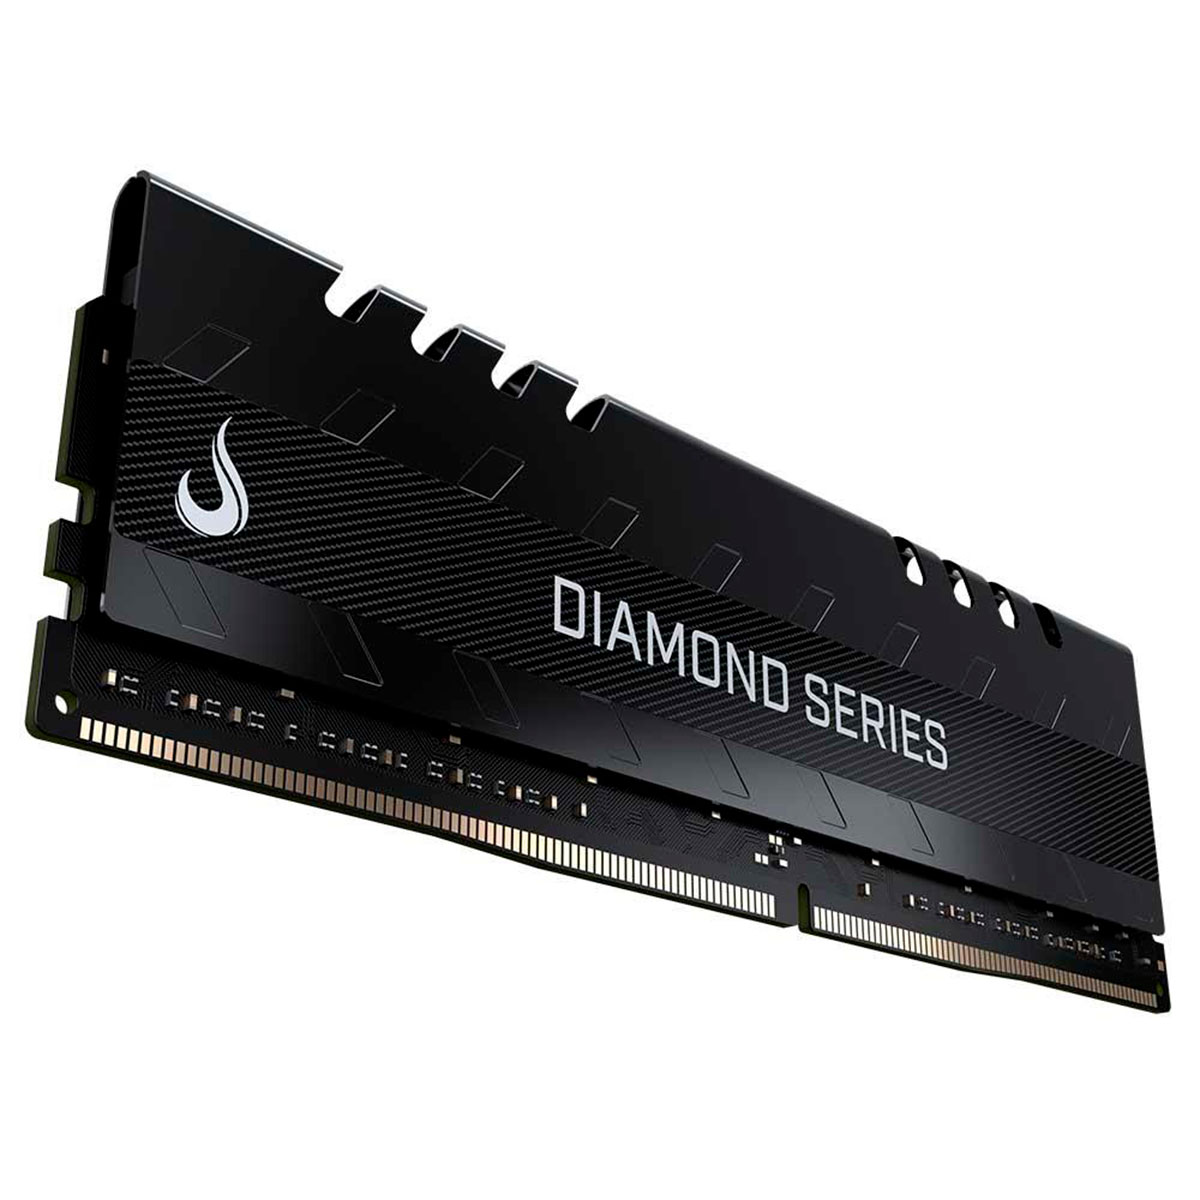 Memória Gamer Rise Mode Diamond 8GB, DDR4, 2400MHz, CL15, Preta - RM-D4-8G-2400D